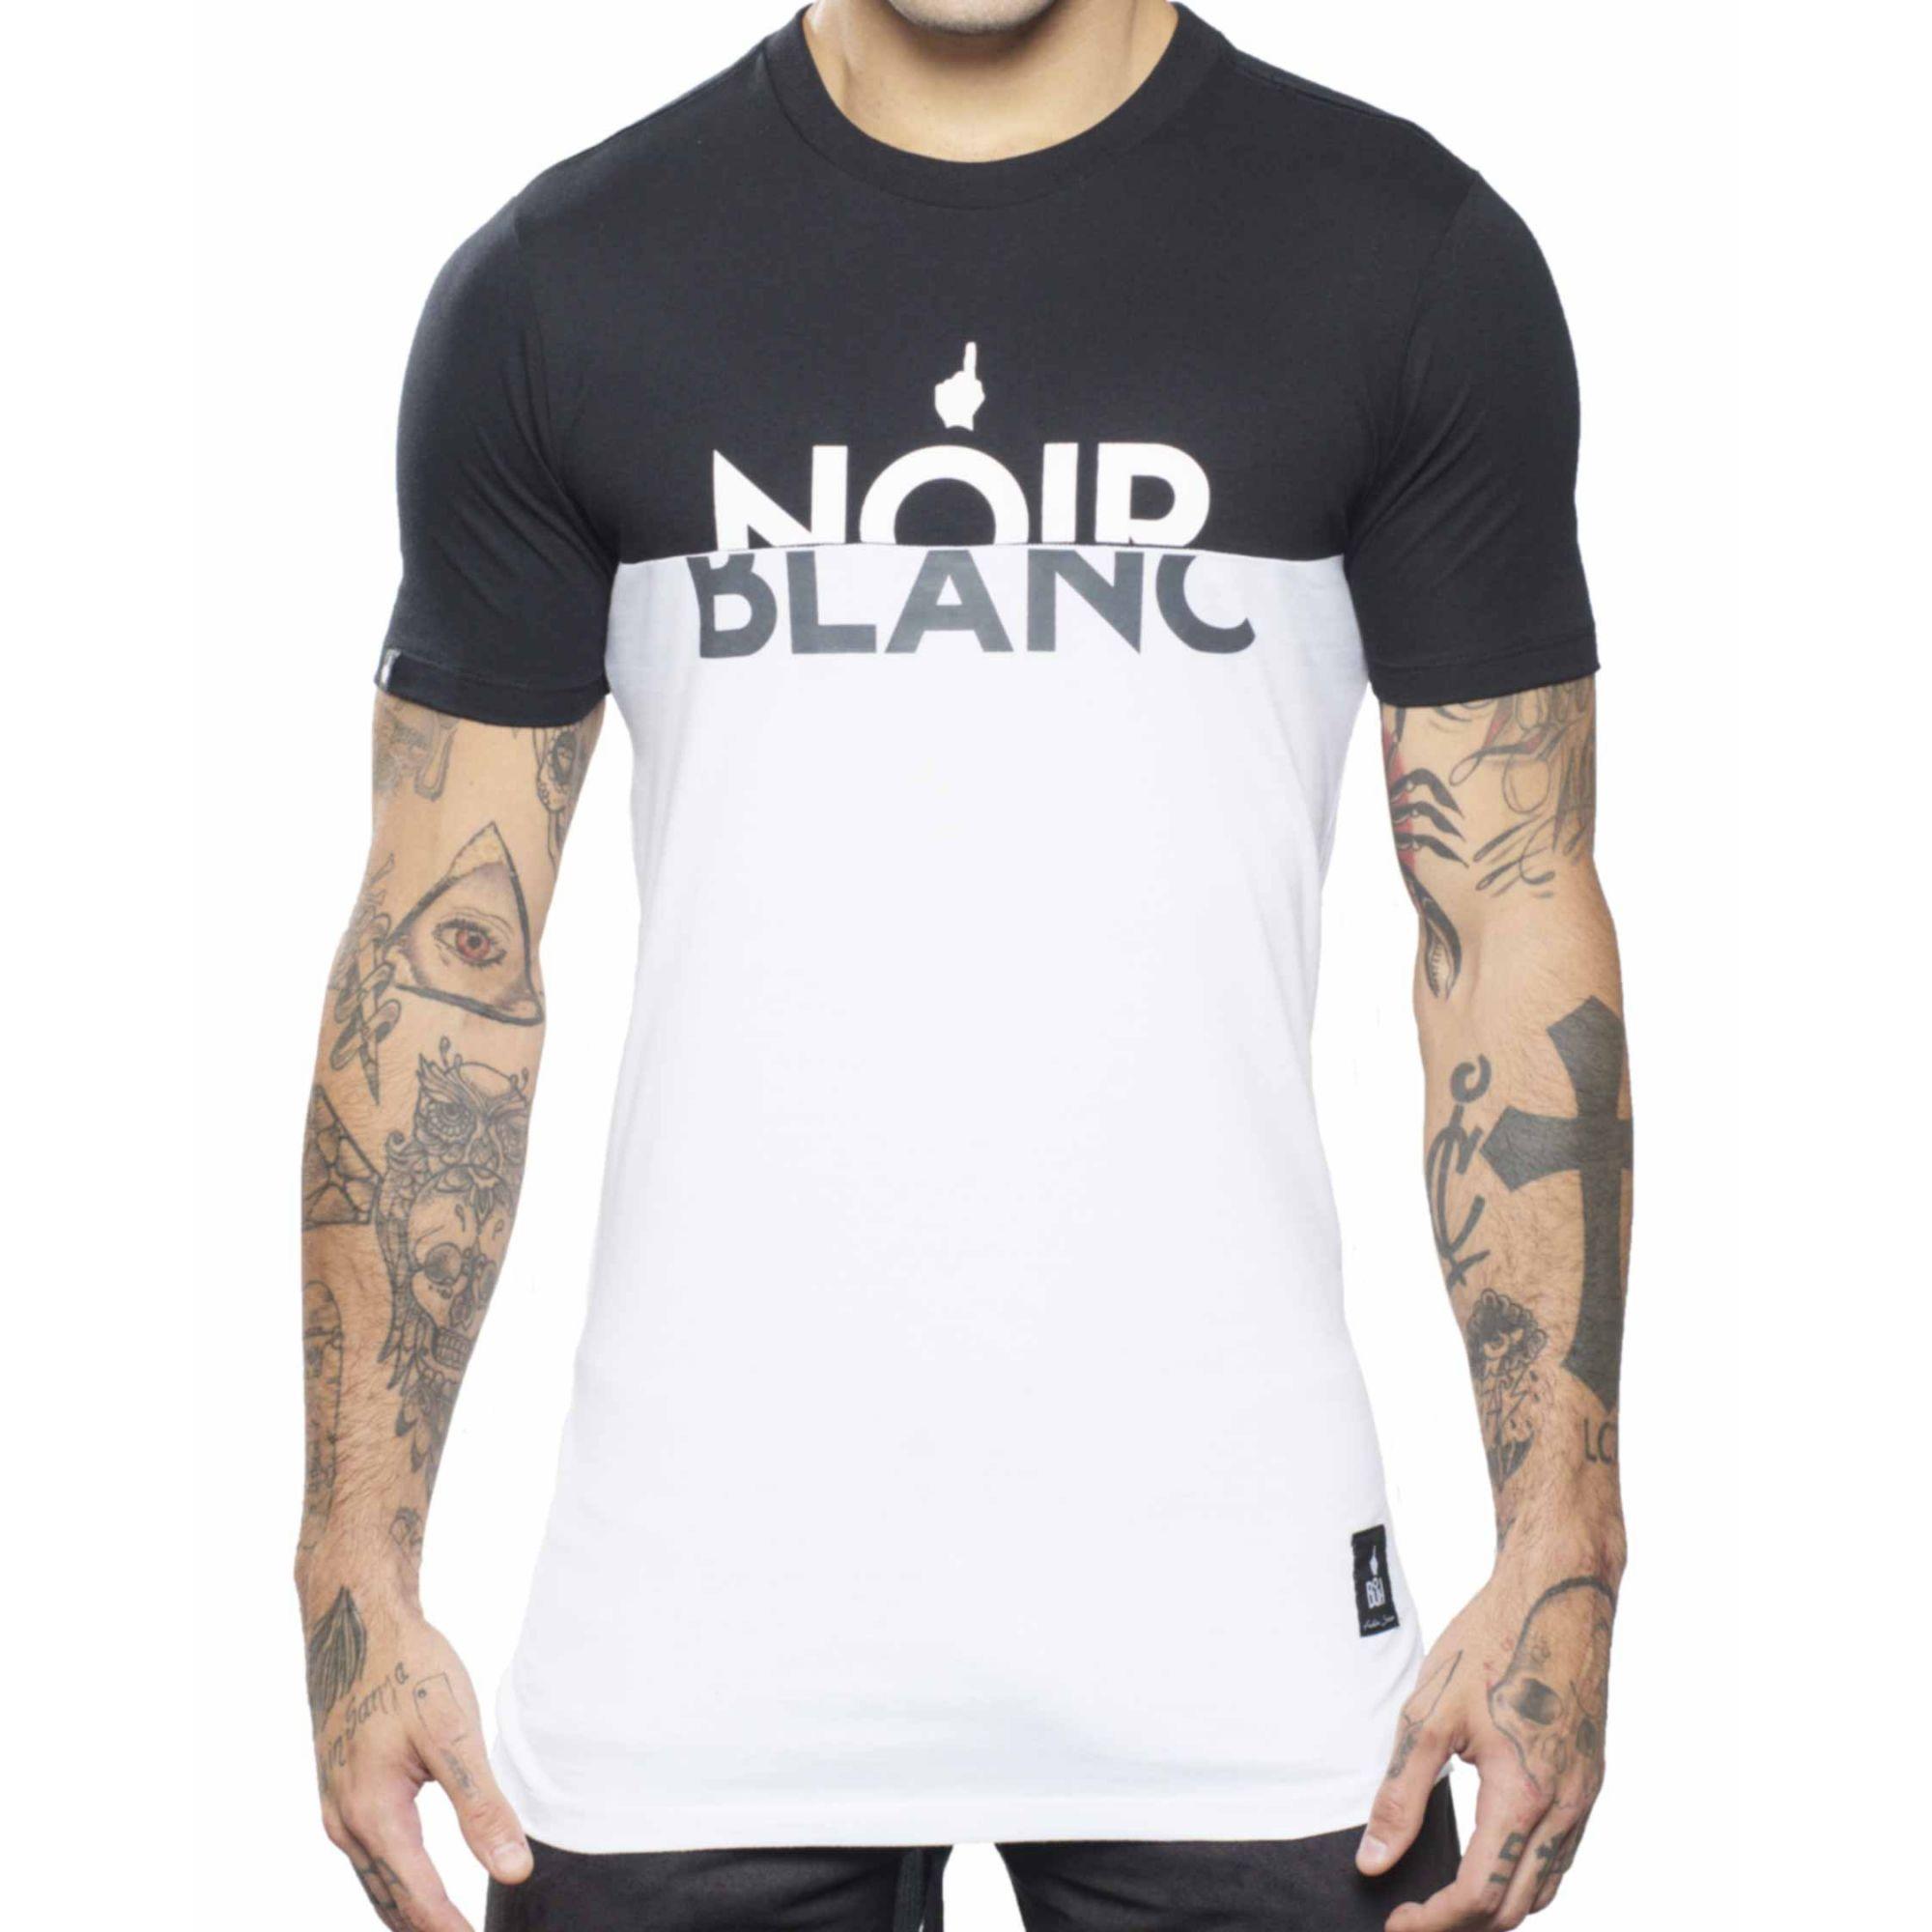 Camiseta Buh Noir Blanc